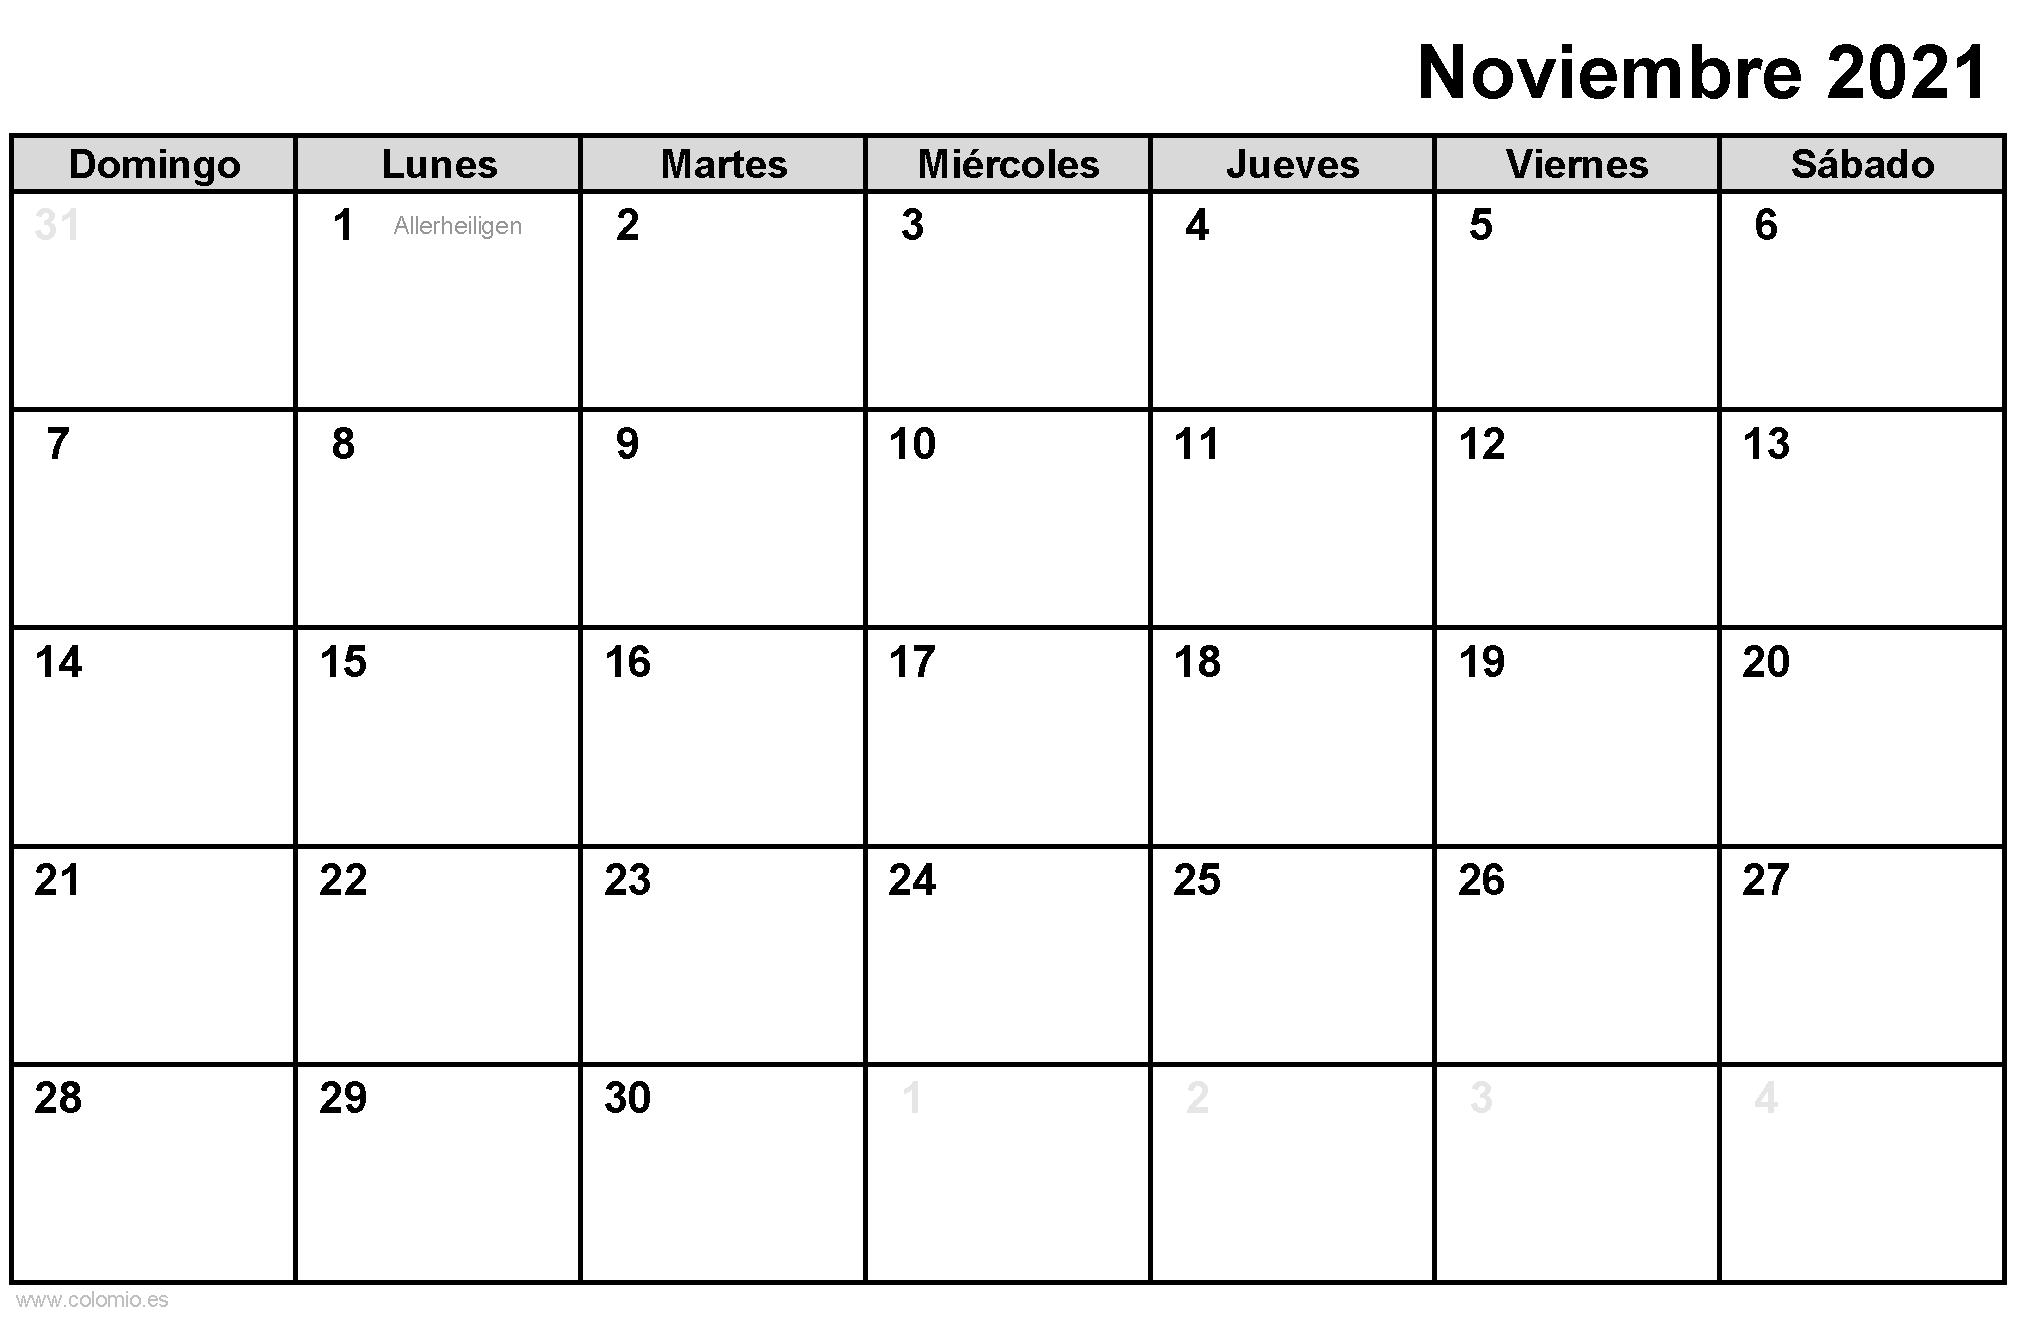 Calendario Noviembre 2021 para imprimir